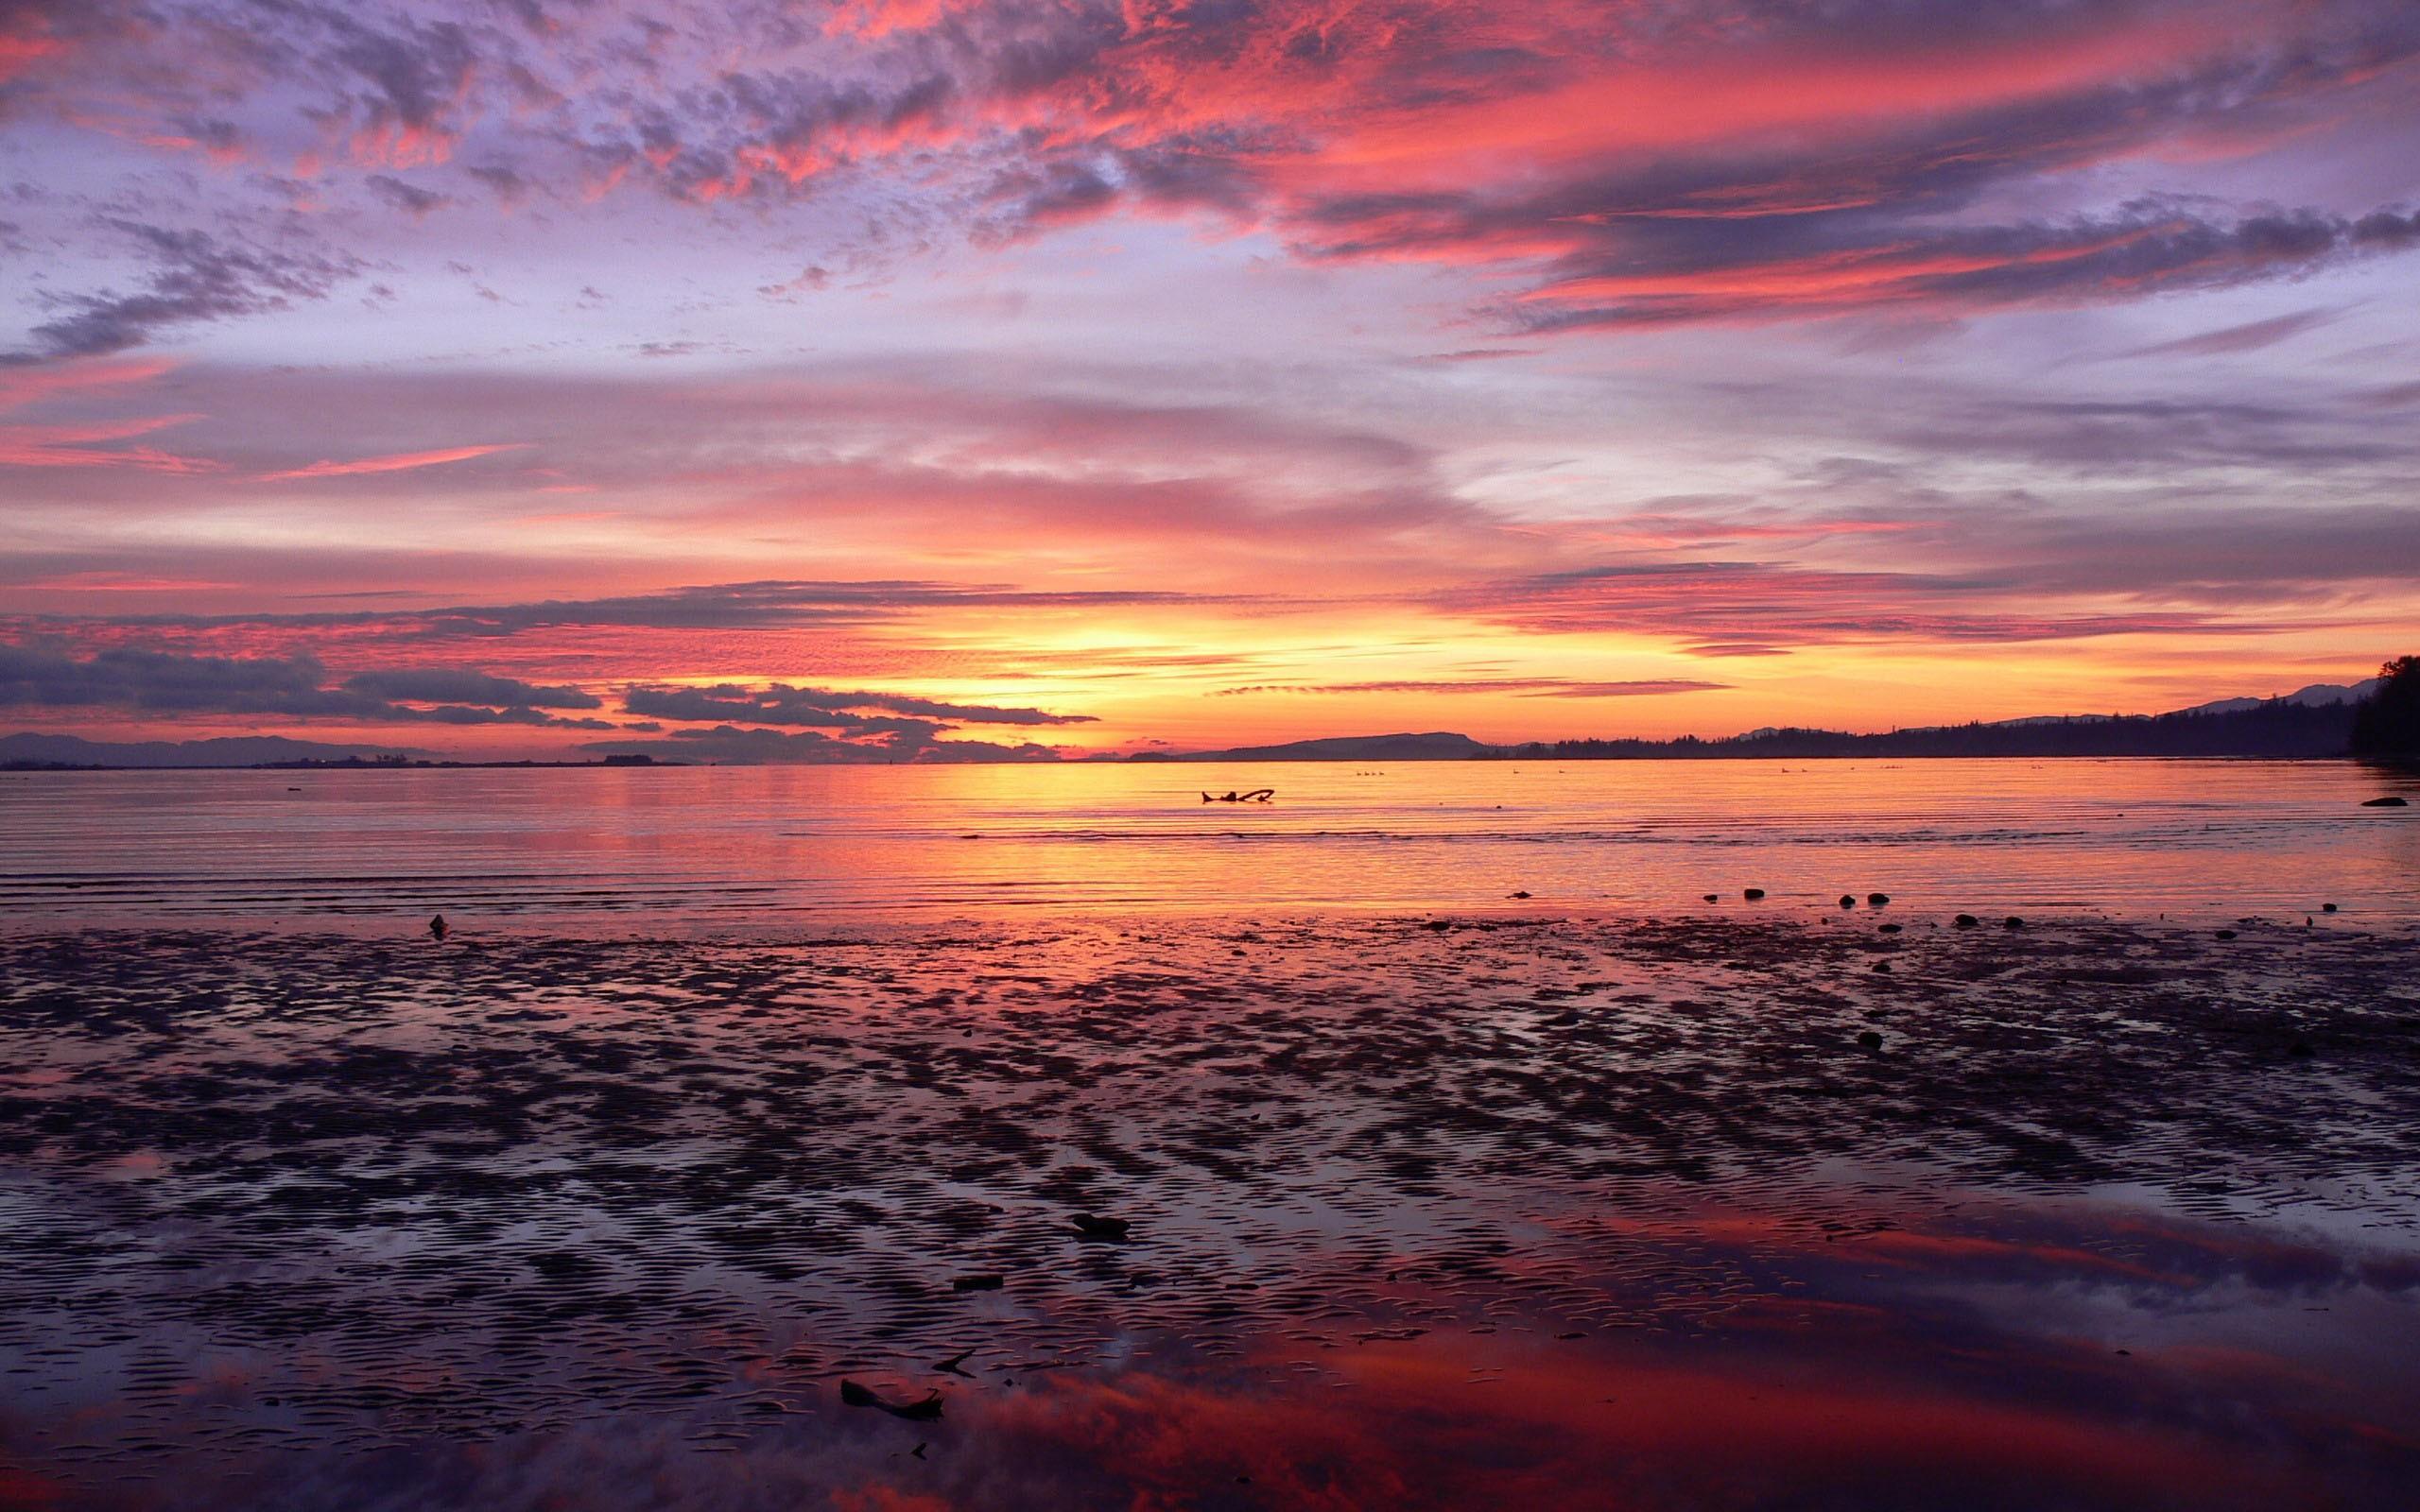 General 2560x1600 landscape nature beach lake sunset purple sky